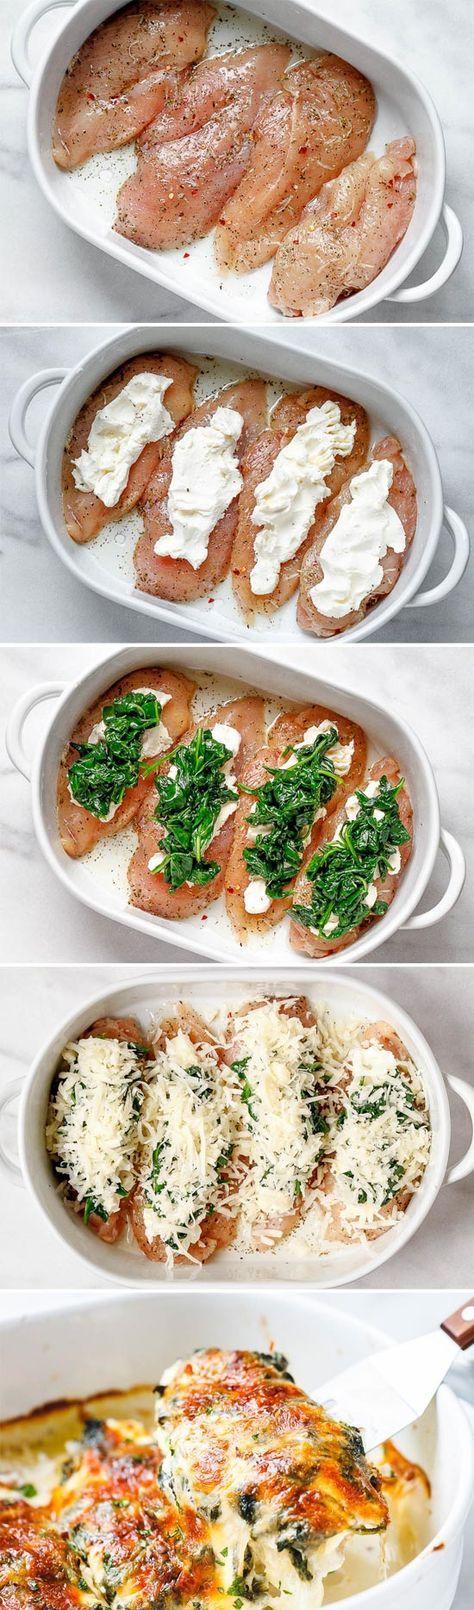 Spinach Chicken Casserole with Cream Cheese and Mozzarella #dinnerrecipesforfamilymaindishes